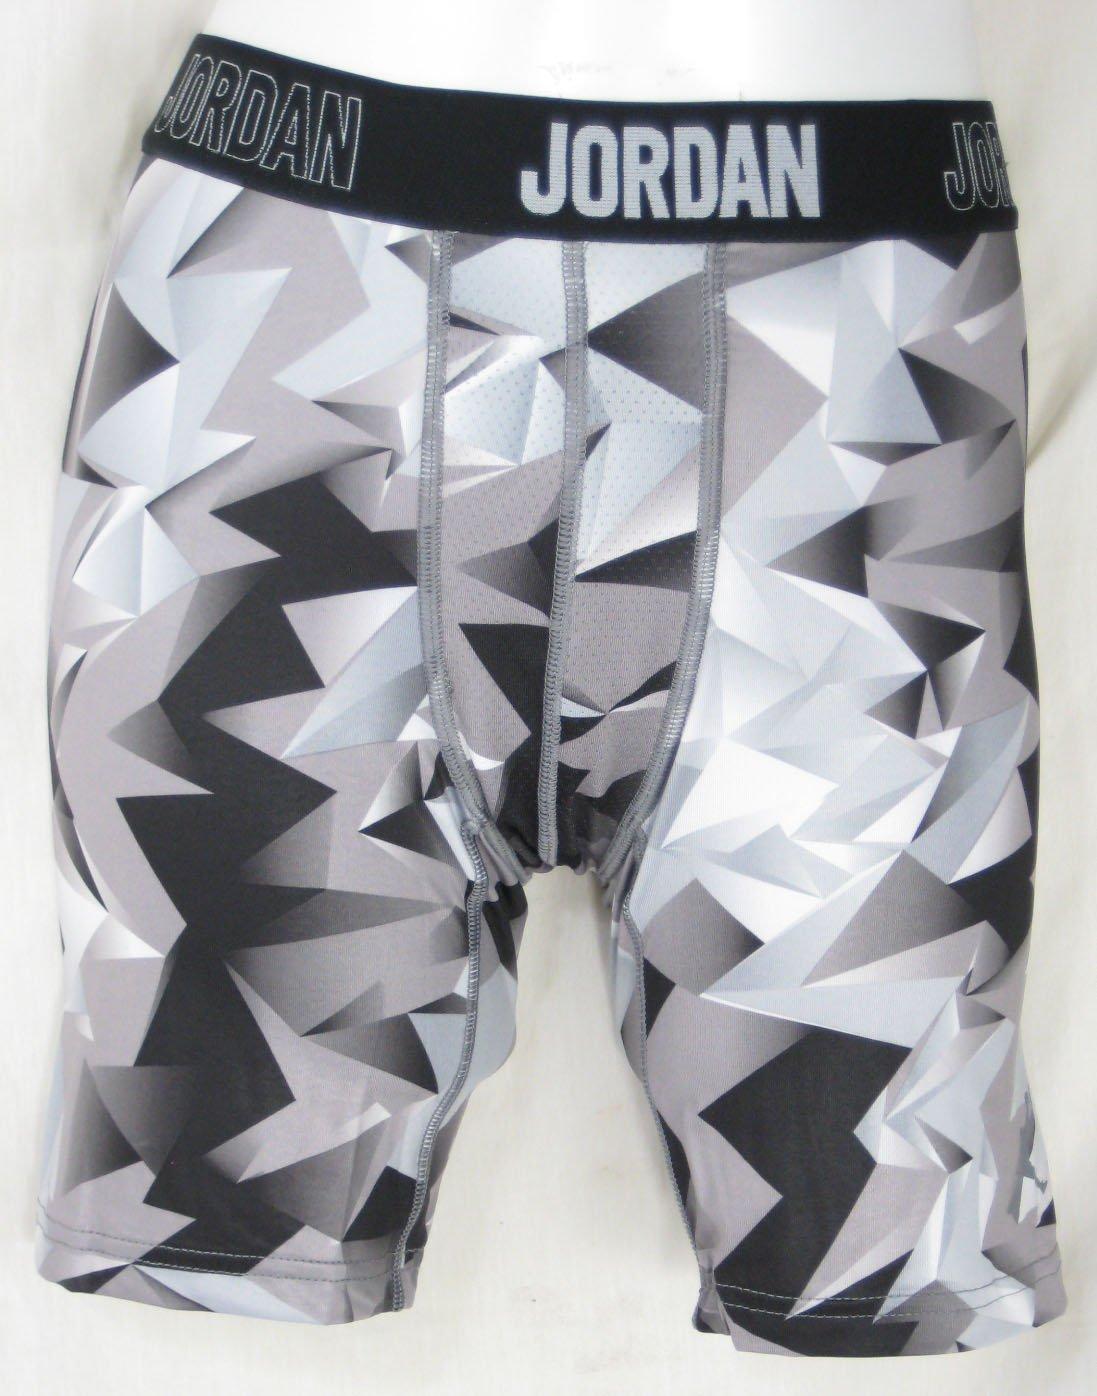 Jordan Jumpman Boys Black Gray Dri-Fit Training Compression Shorts Sz Med by NIKE